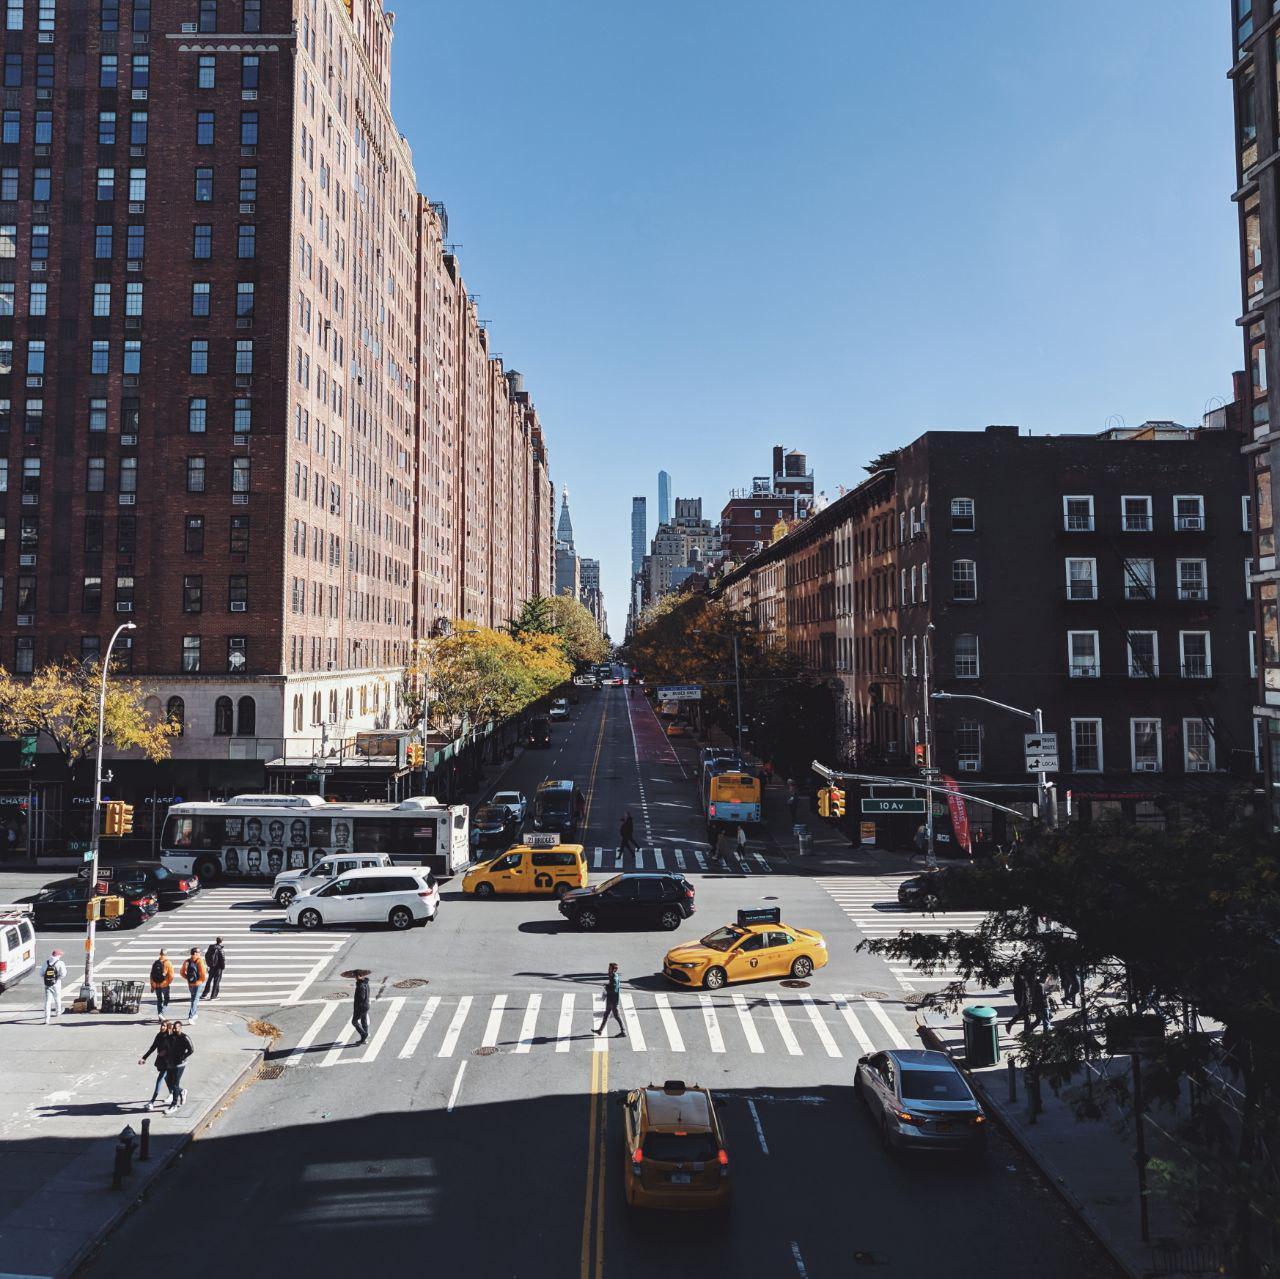 New York, again